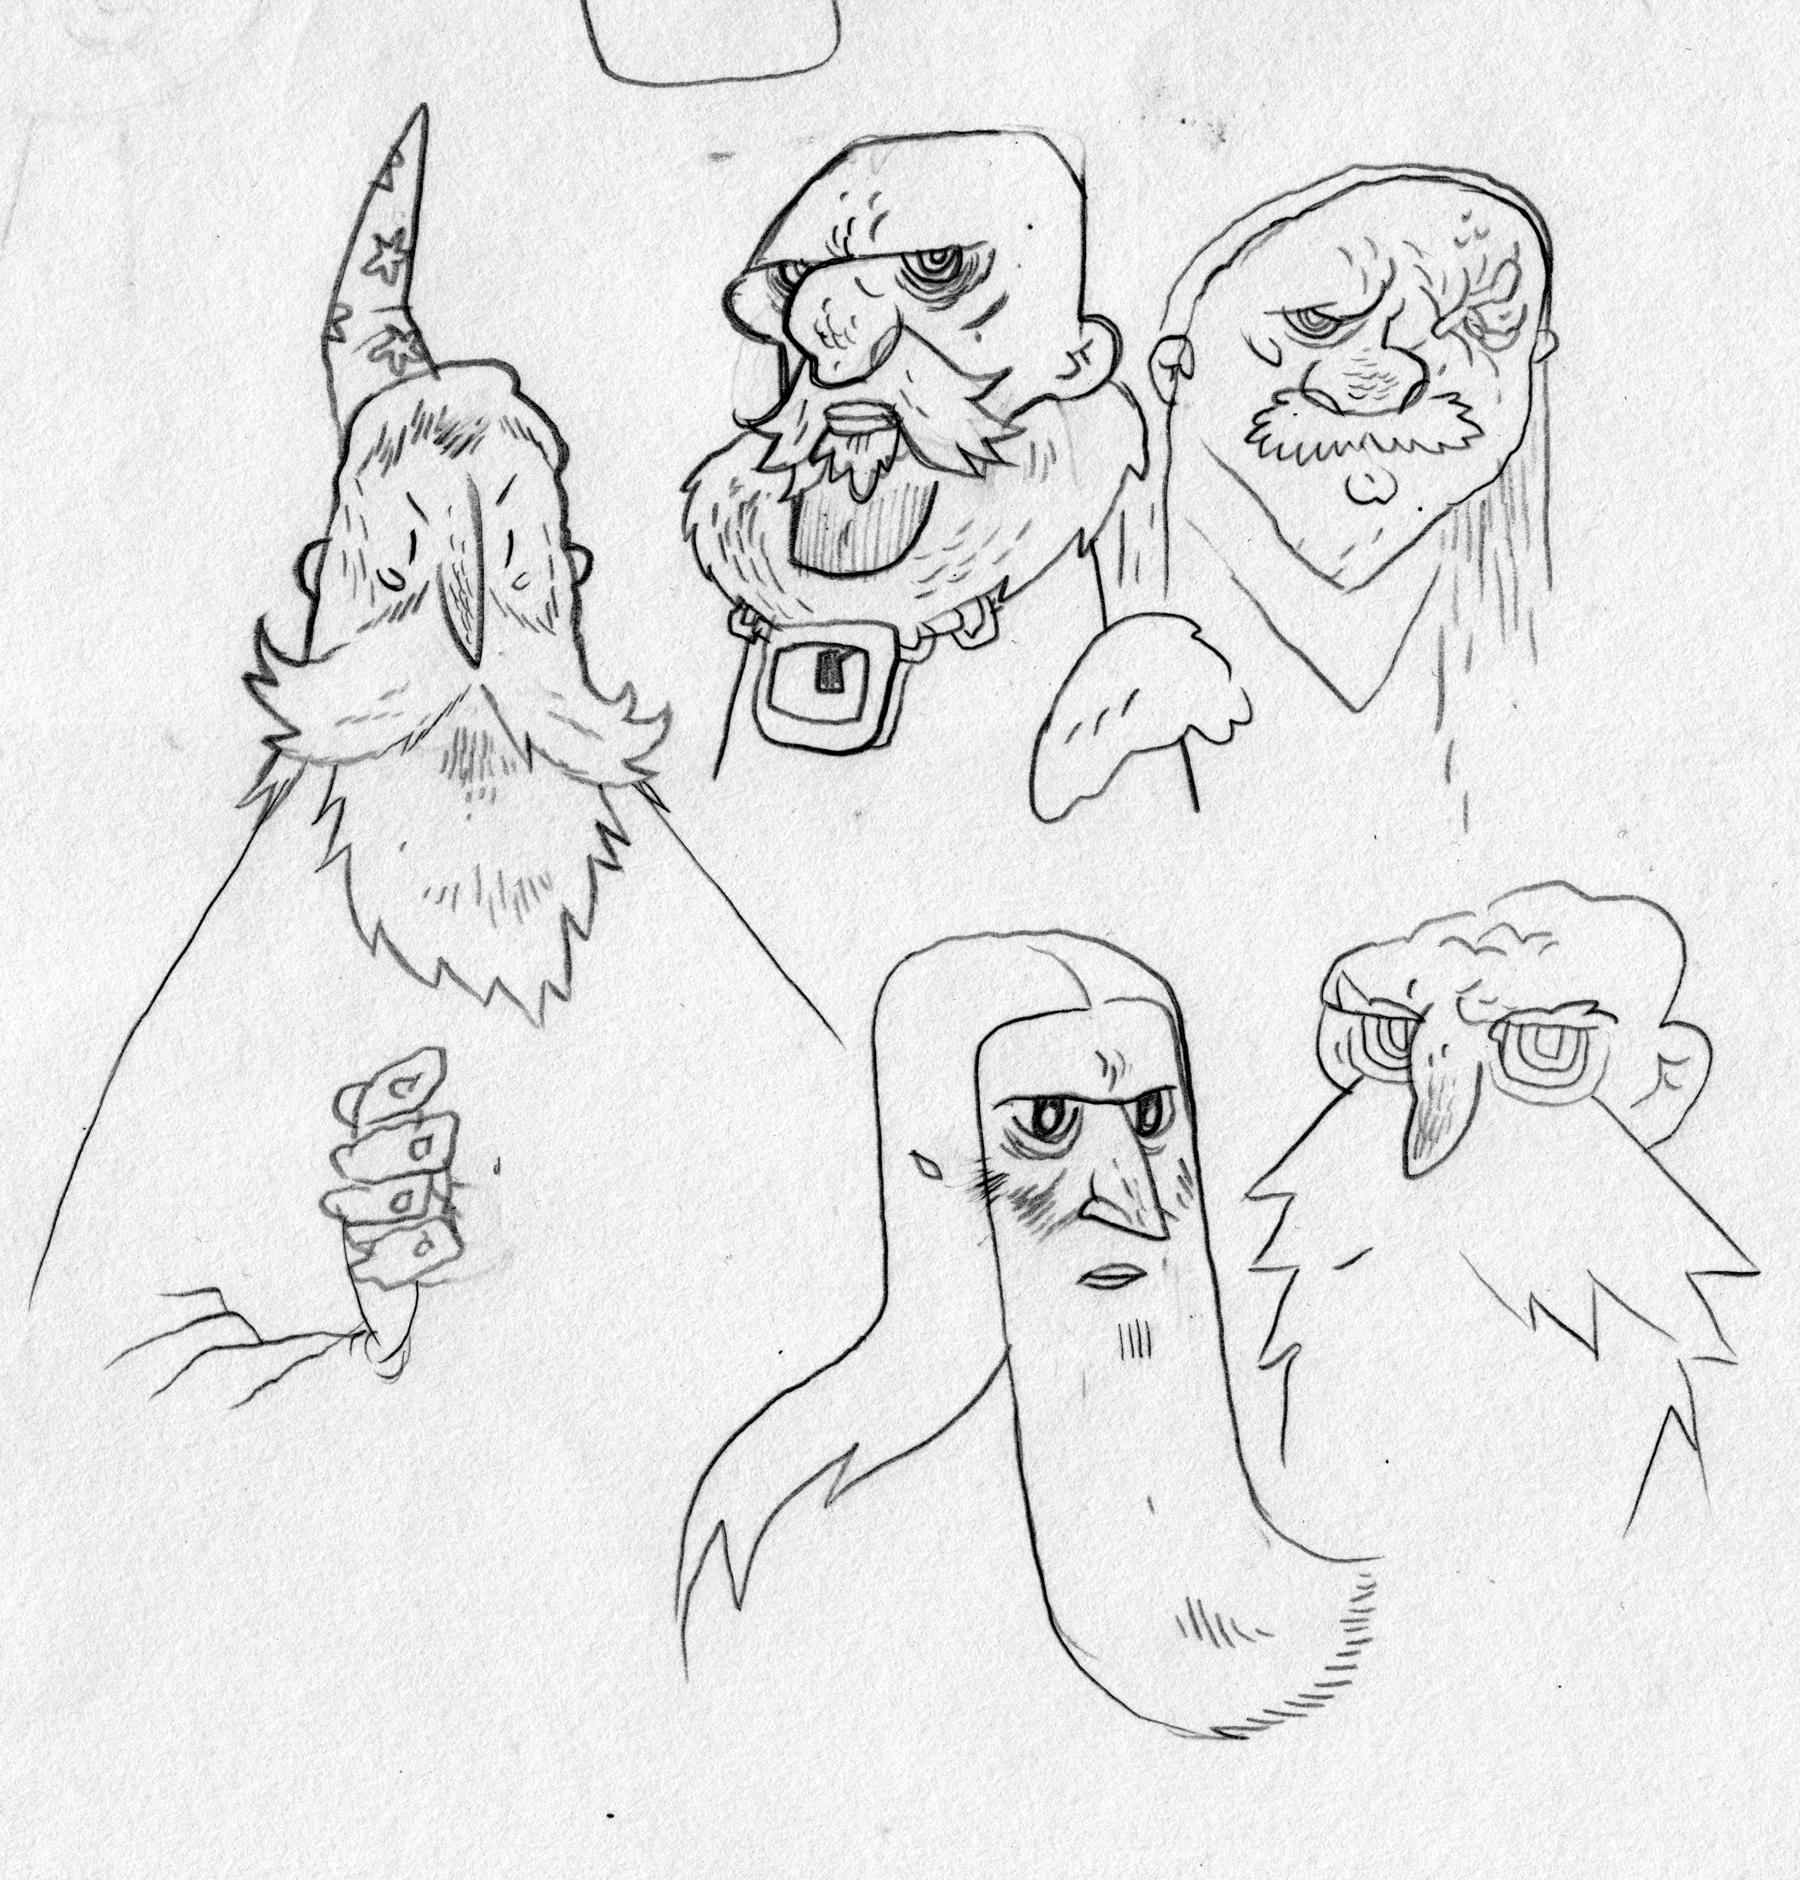 More wizard studies.